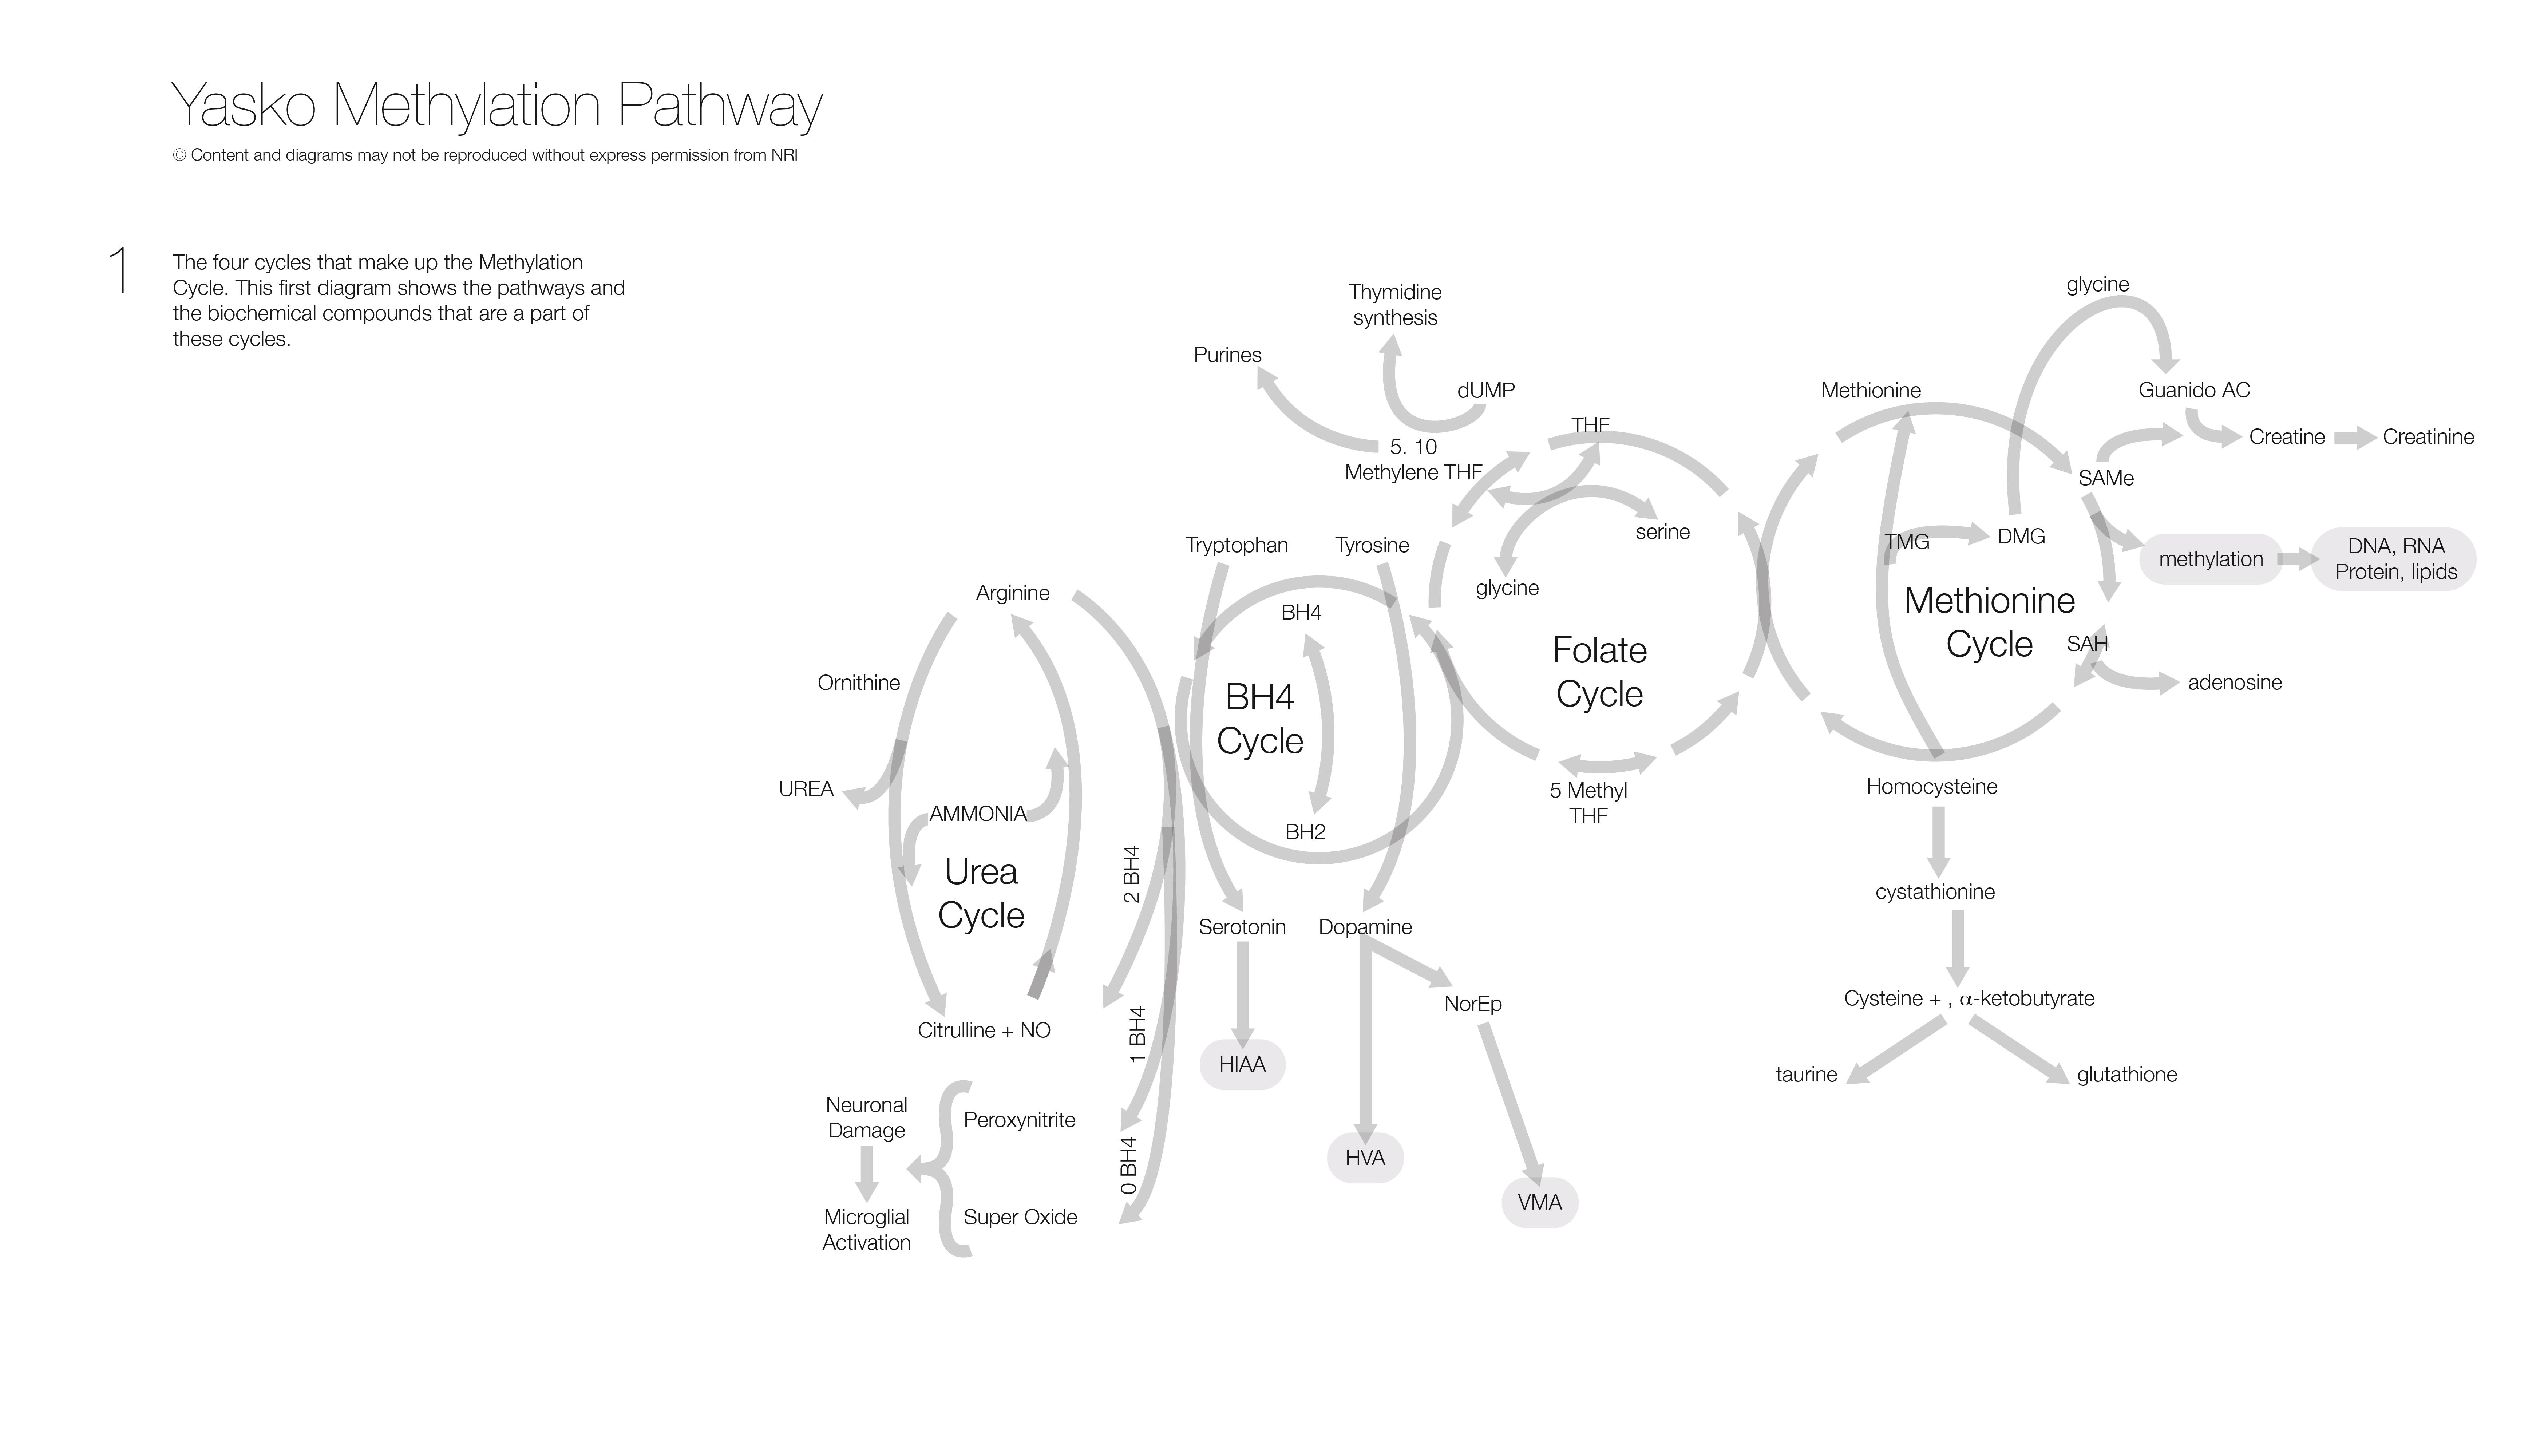 Yasko Methylation Pathway - 1